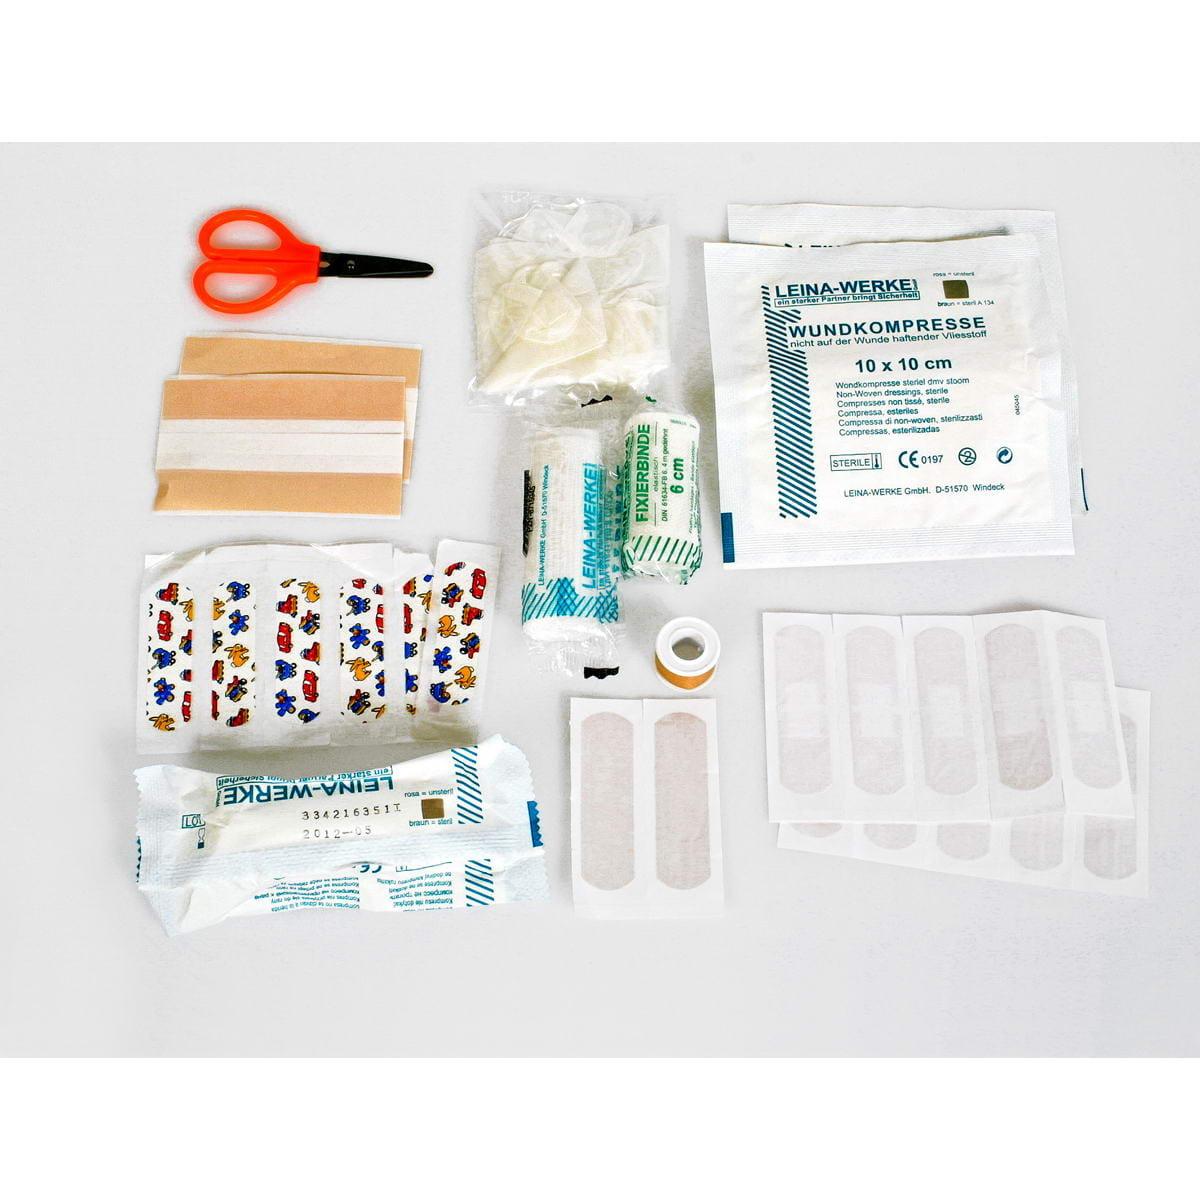 Relags Standard - Erste-Hilfe-Set - Bild 2